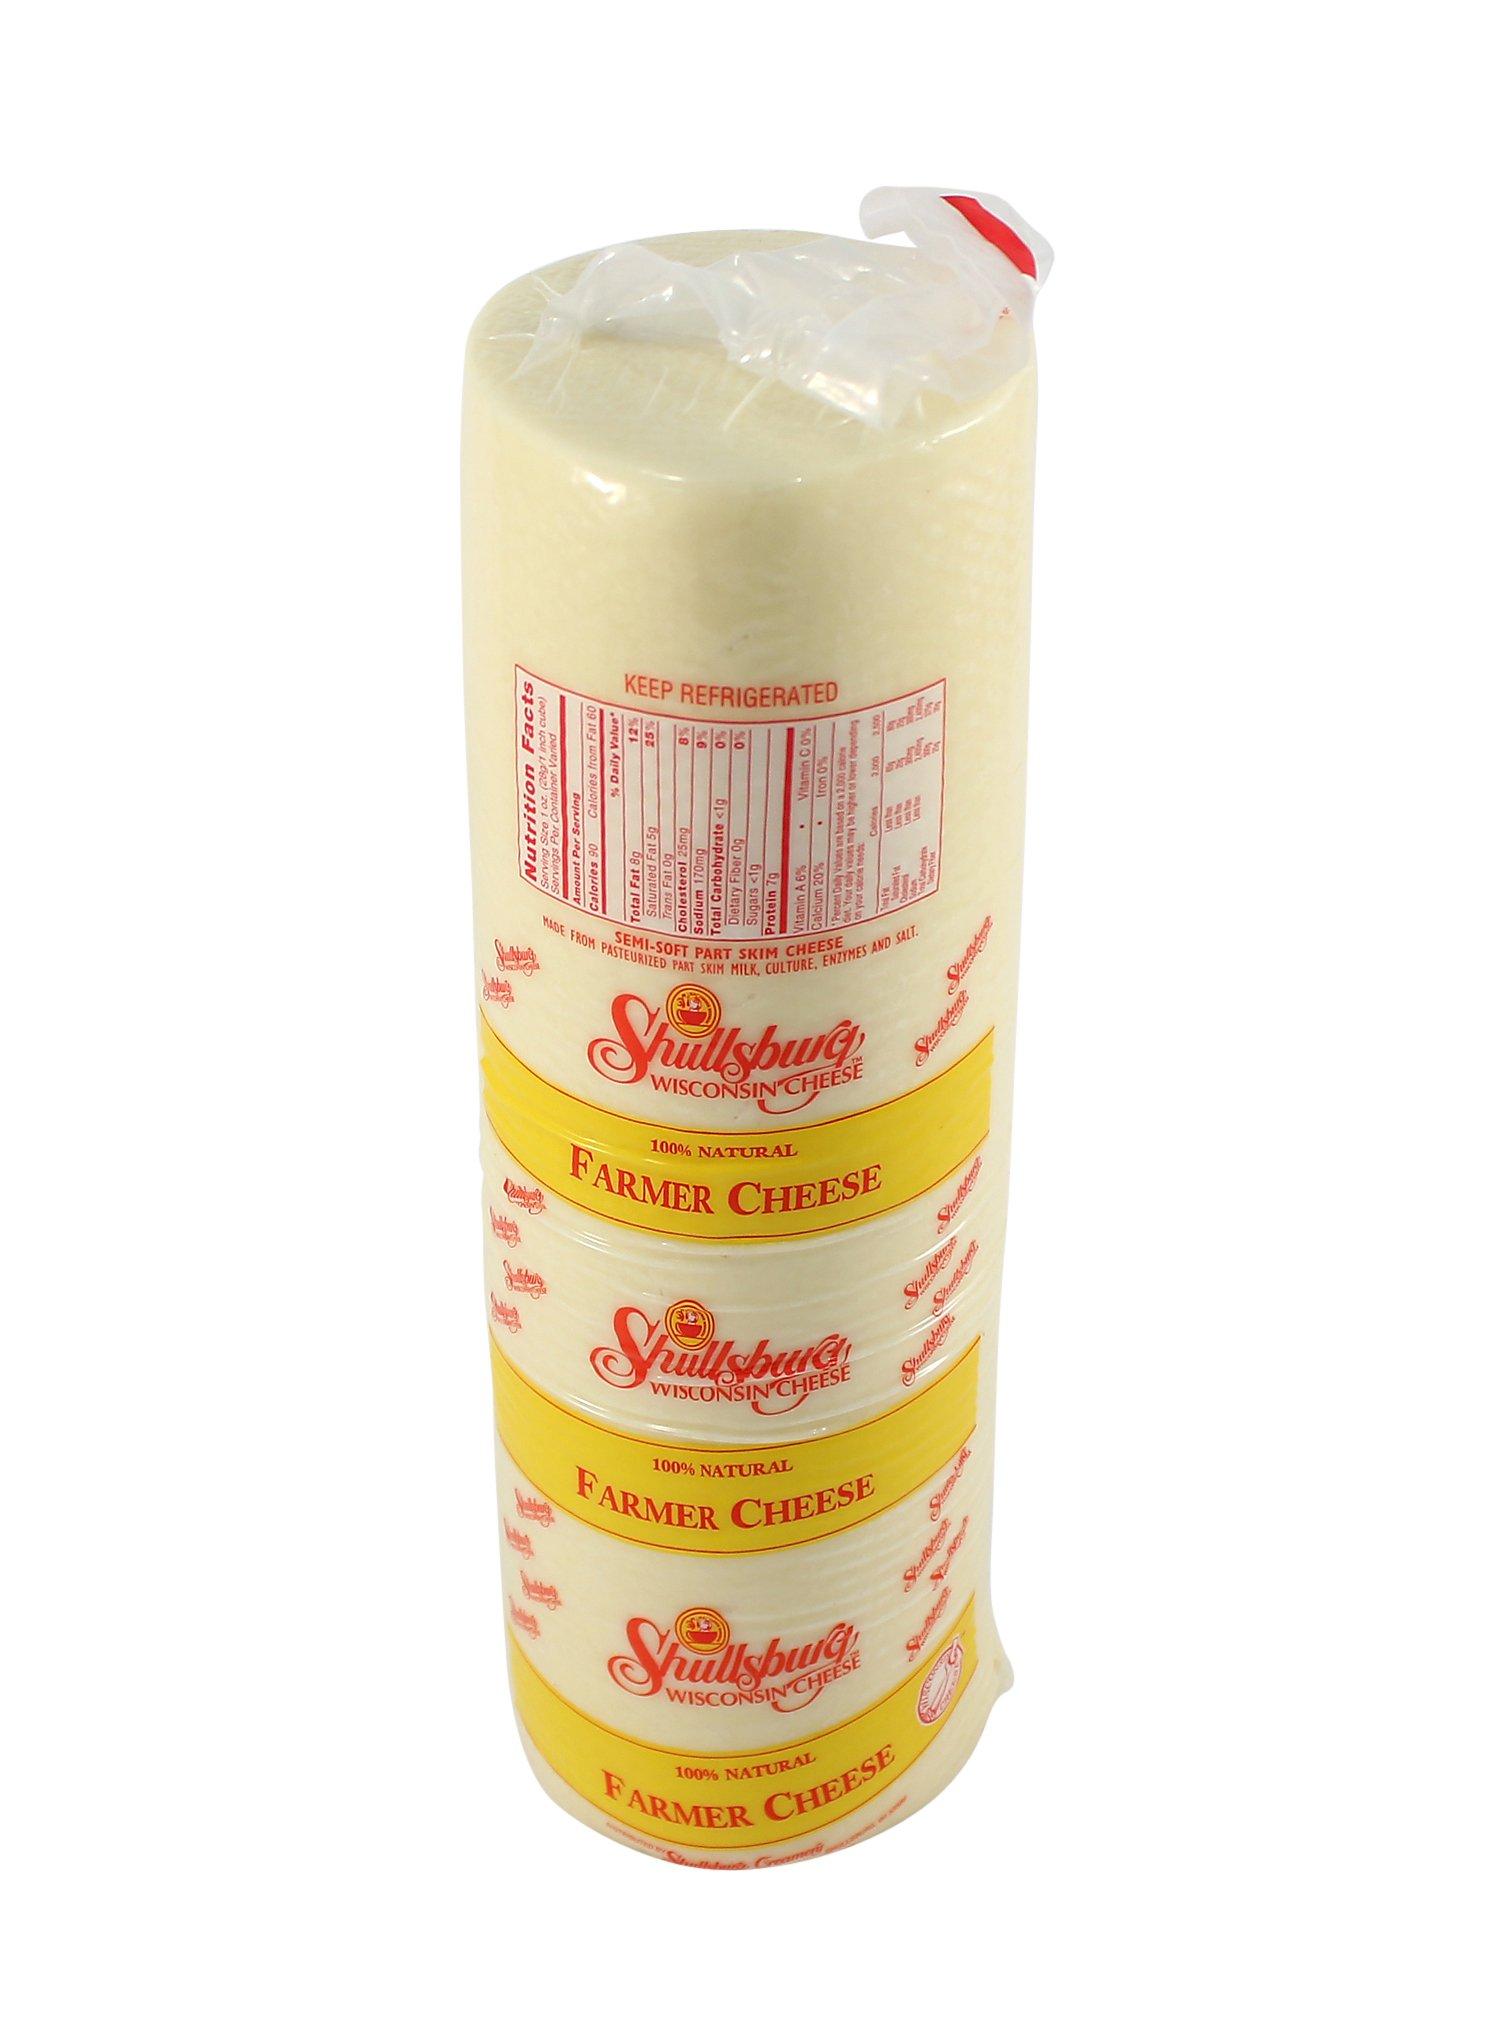 Shullsburg Creamery - Farmer Cheese - 6 Pound Mini Deli Horn